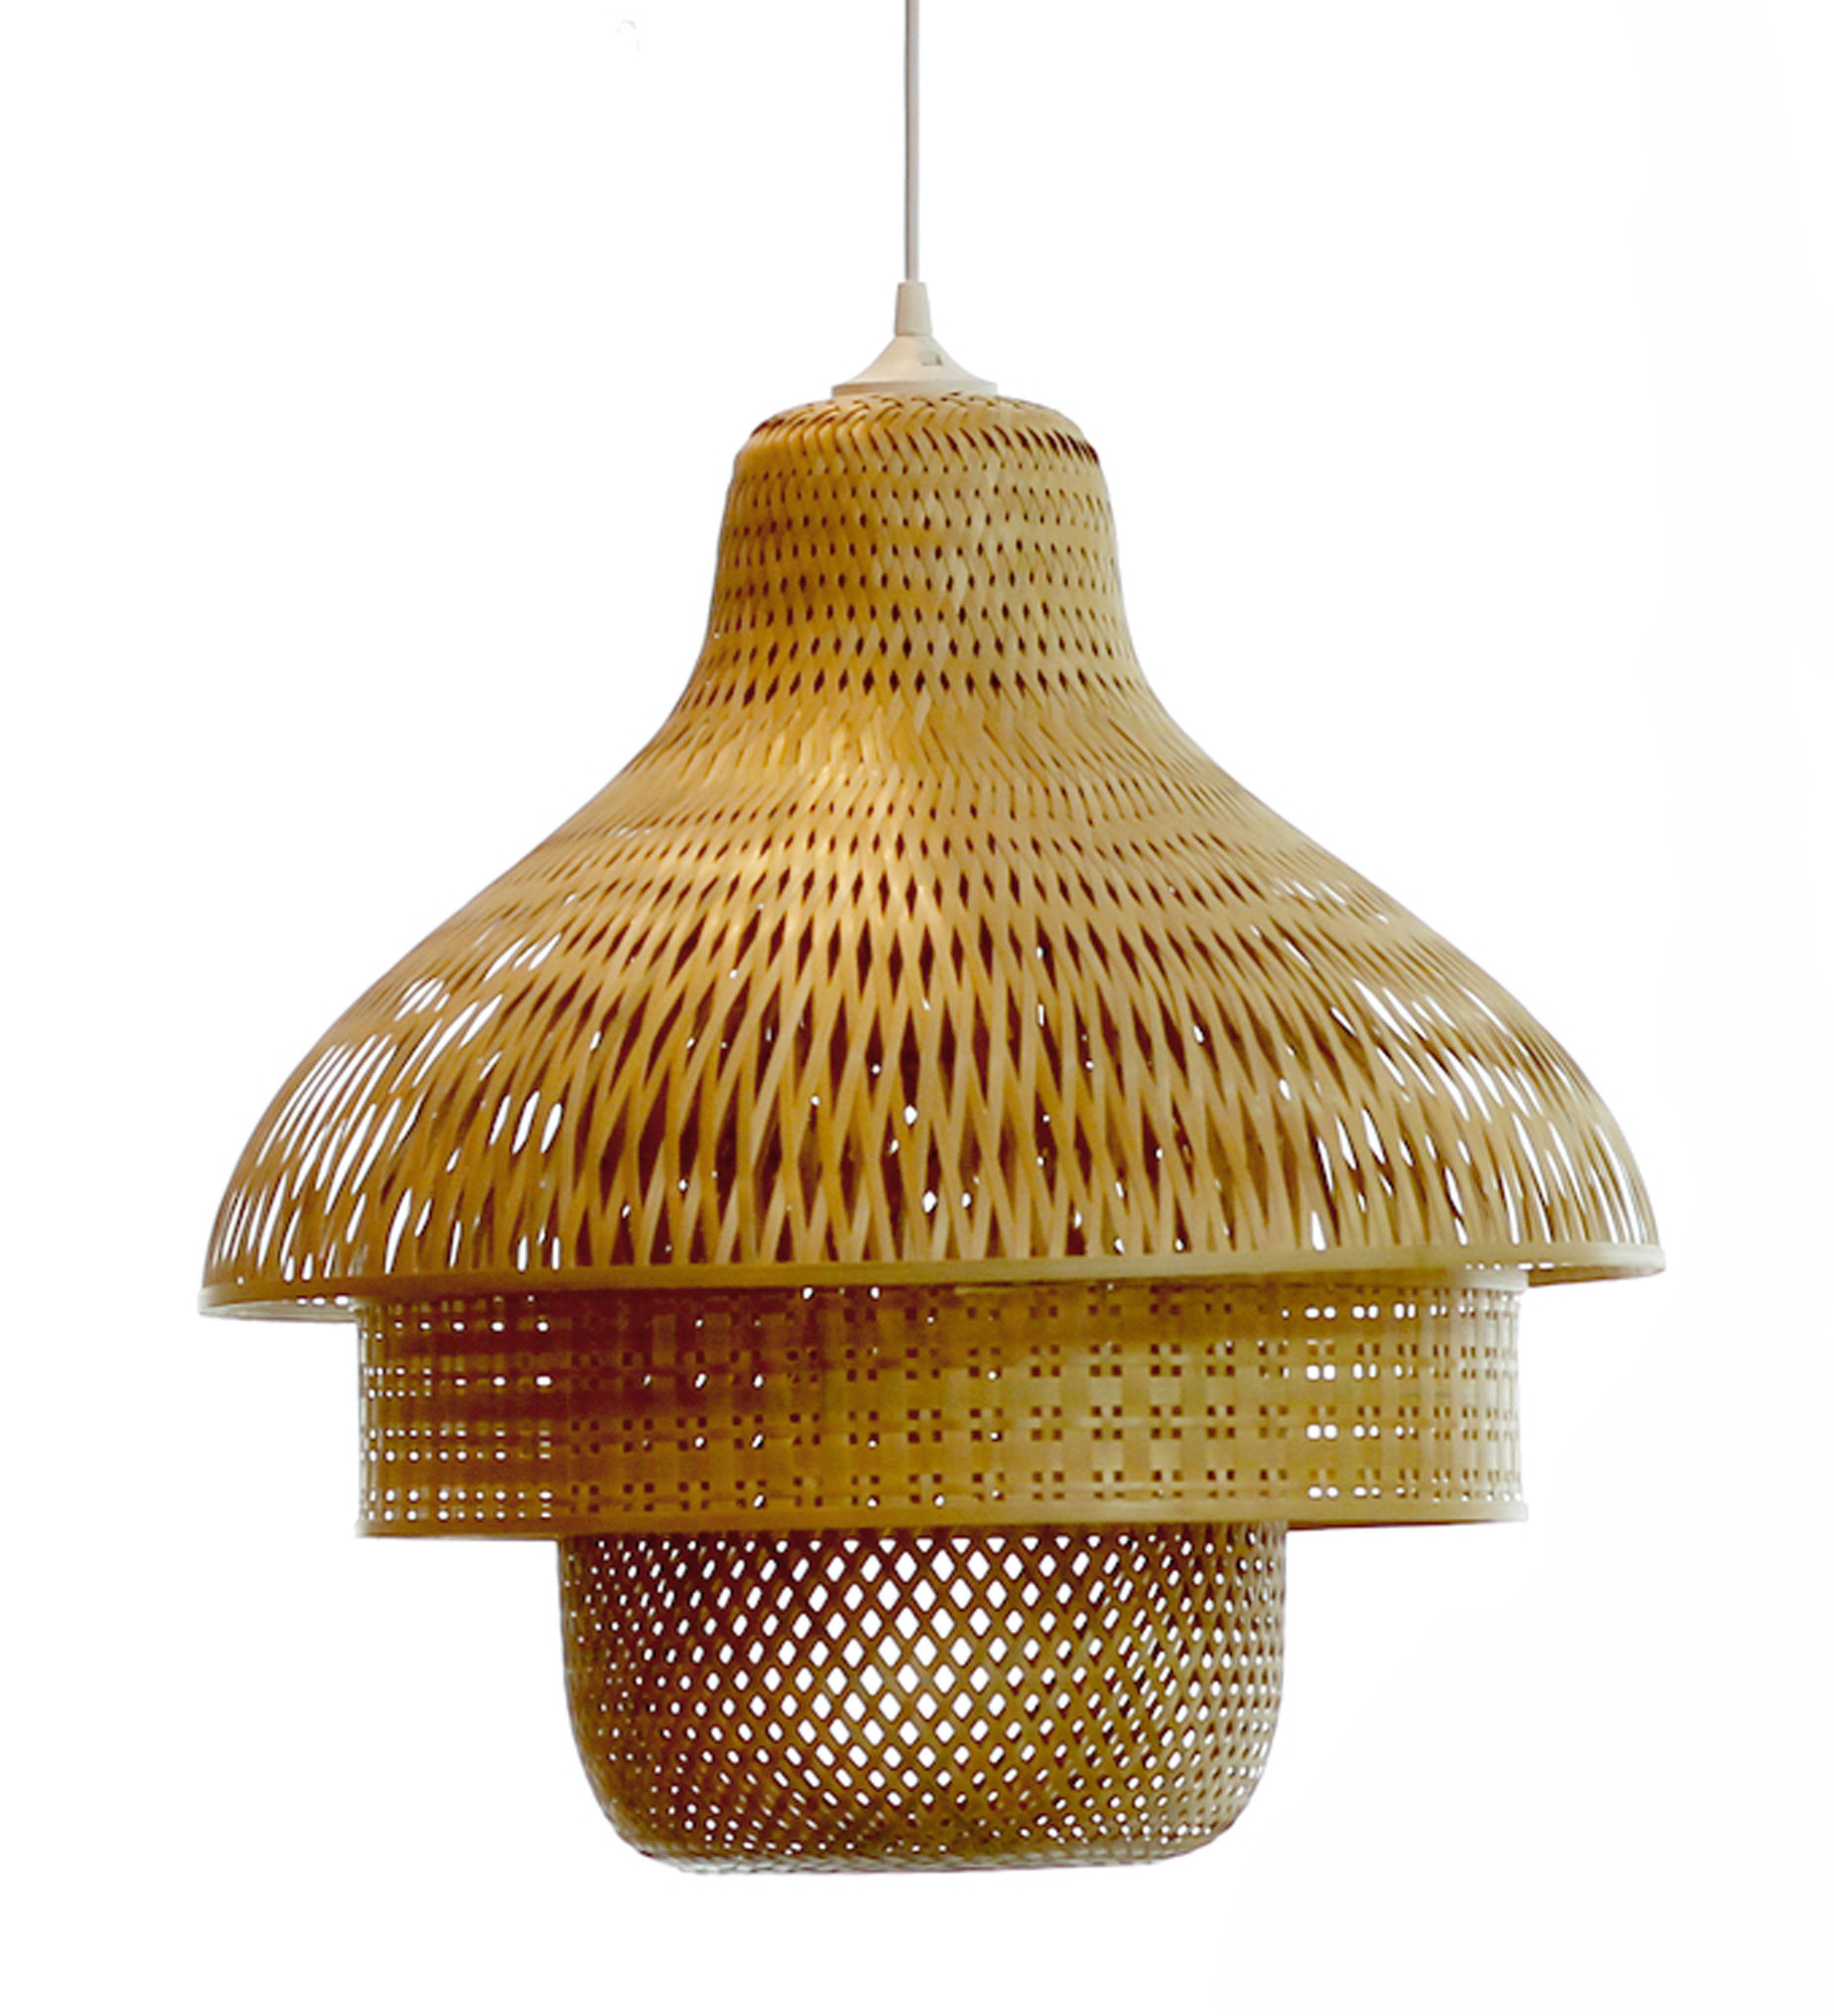 Suspension Hanoi Pop Corn - Bambou - L 80 x h 50 x Ø 50 | Made In Design